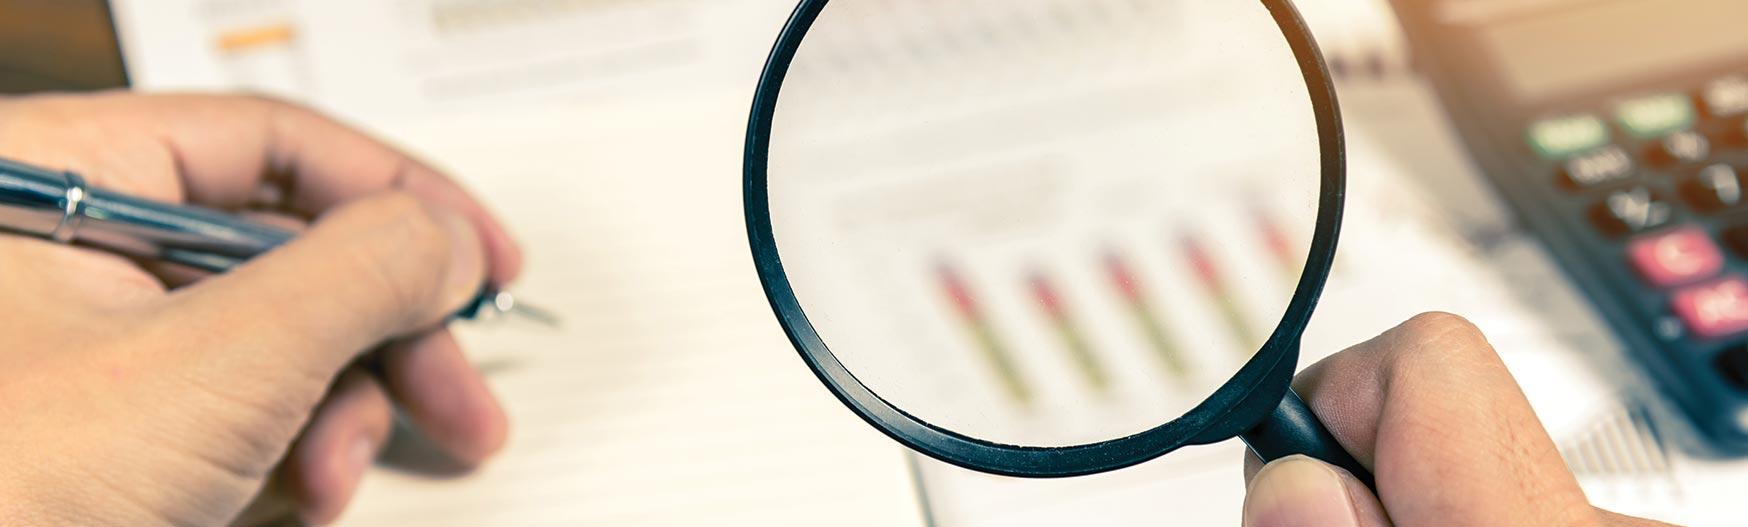 Audit analyse & évaluation